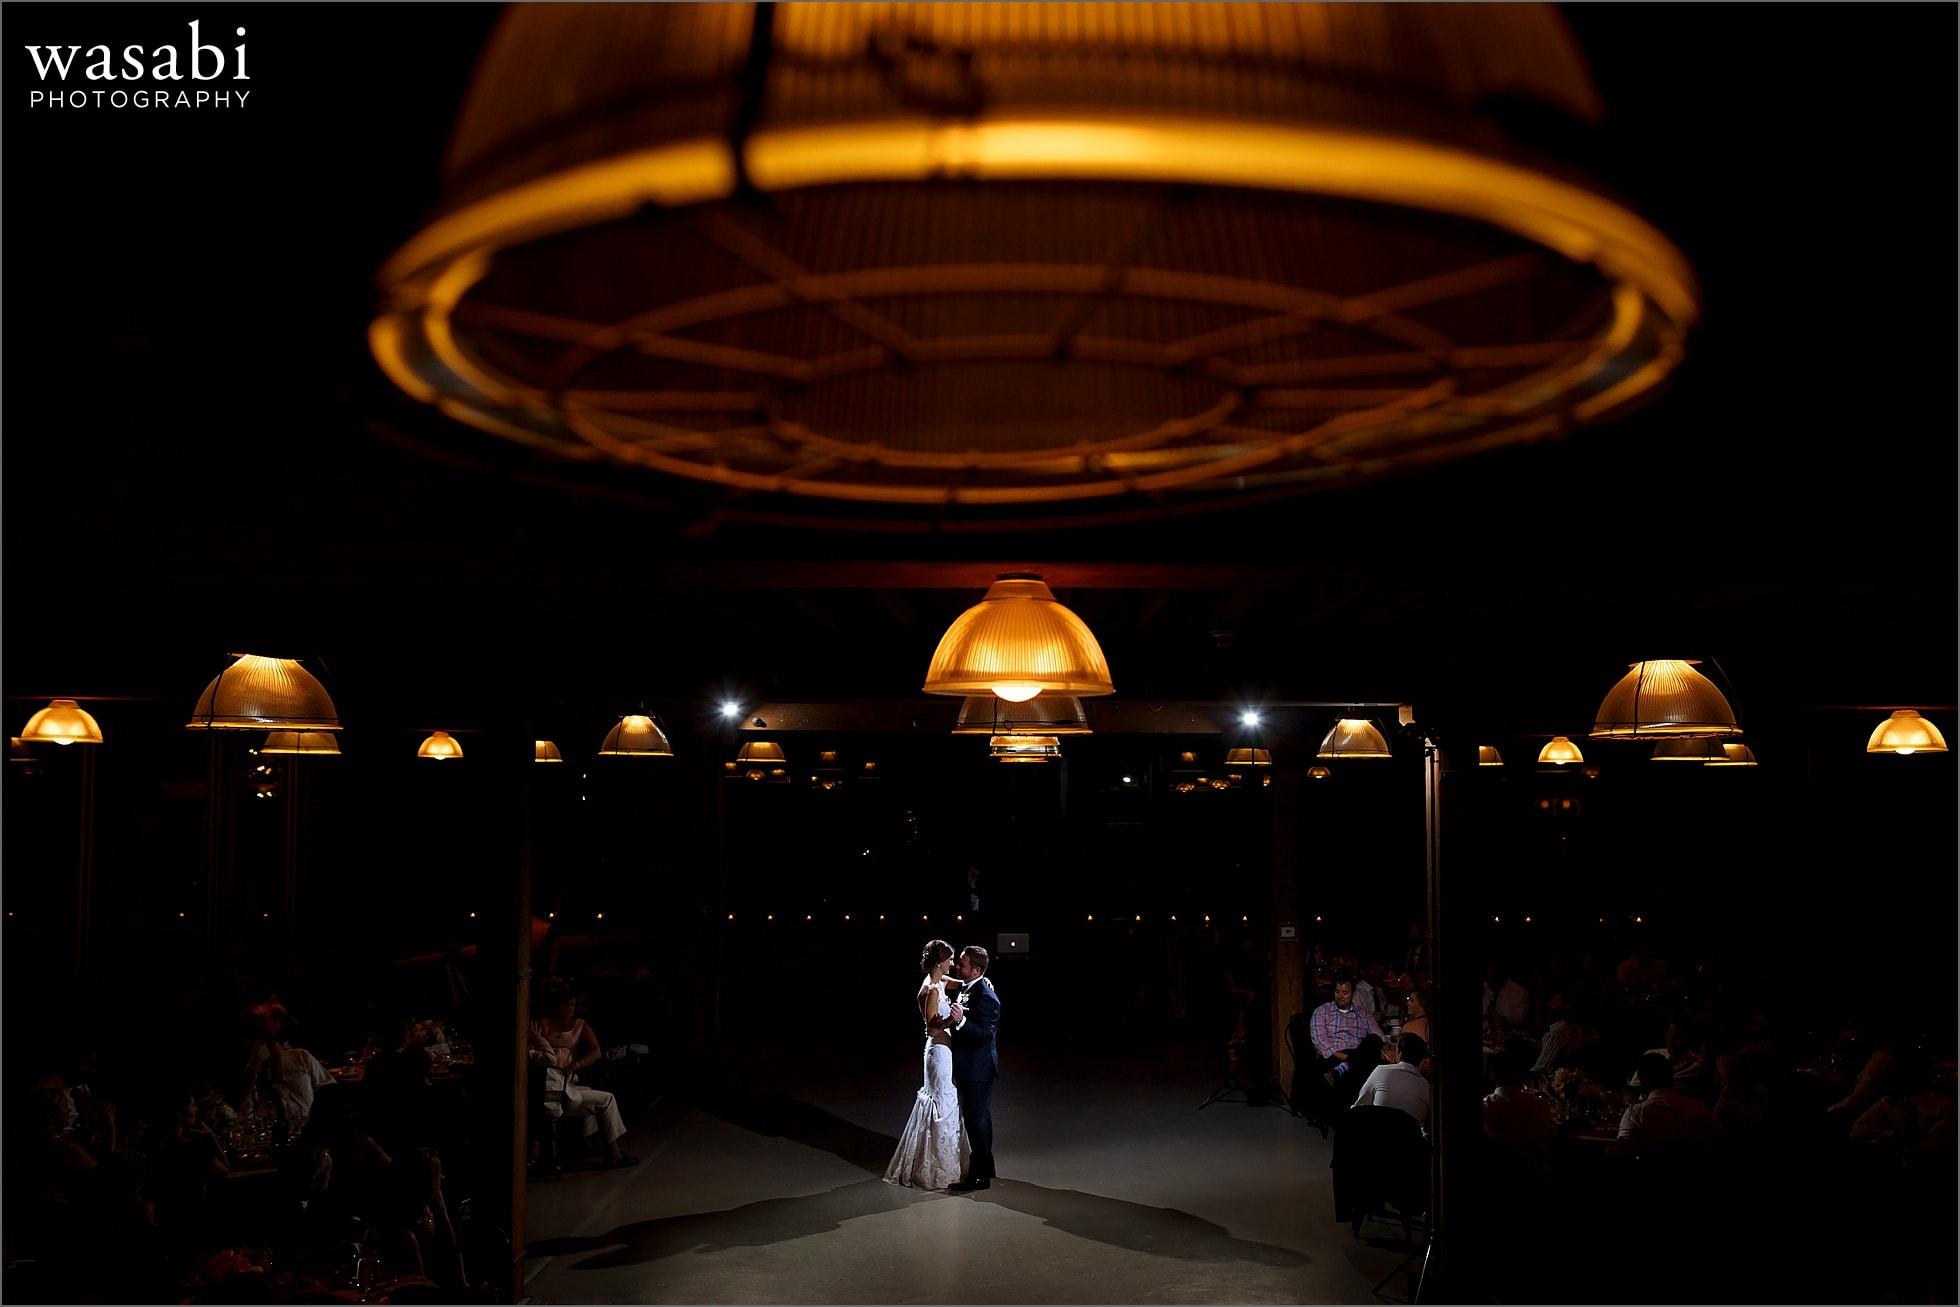 Architectural Artifacts Wedding Photos Wasabi PhotographyChicago Wedding Ph